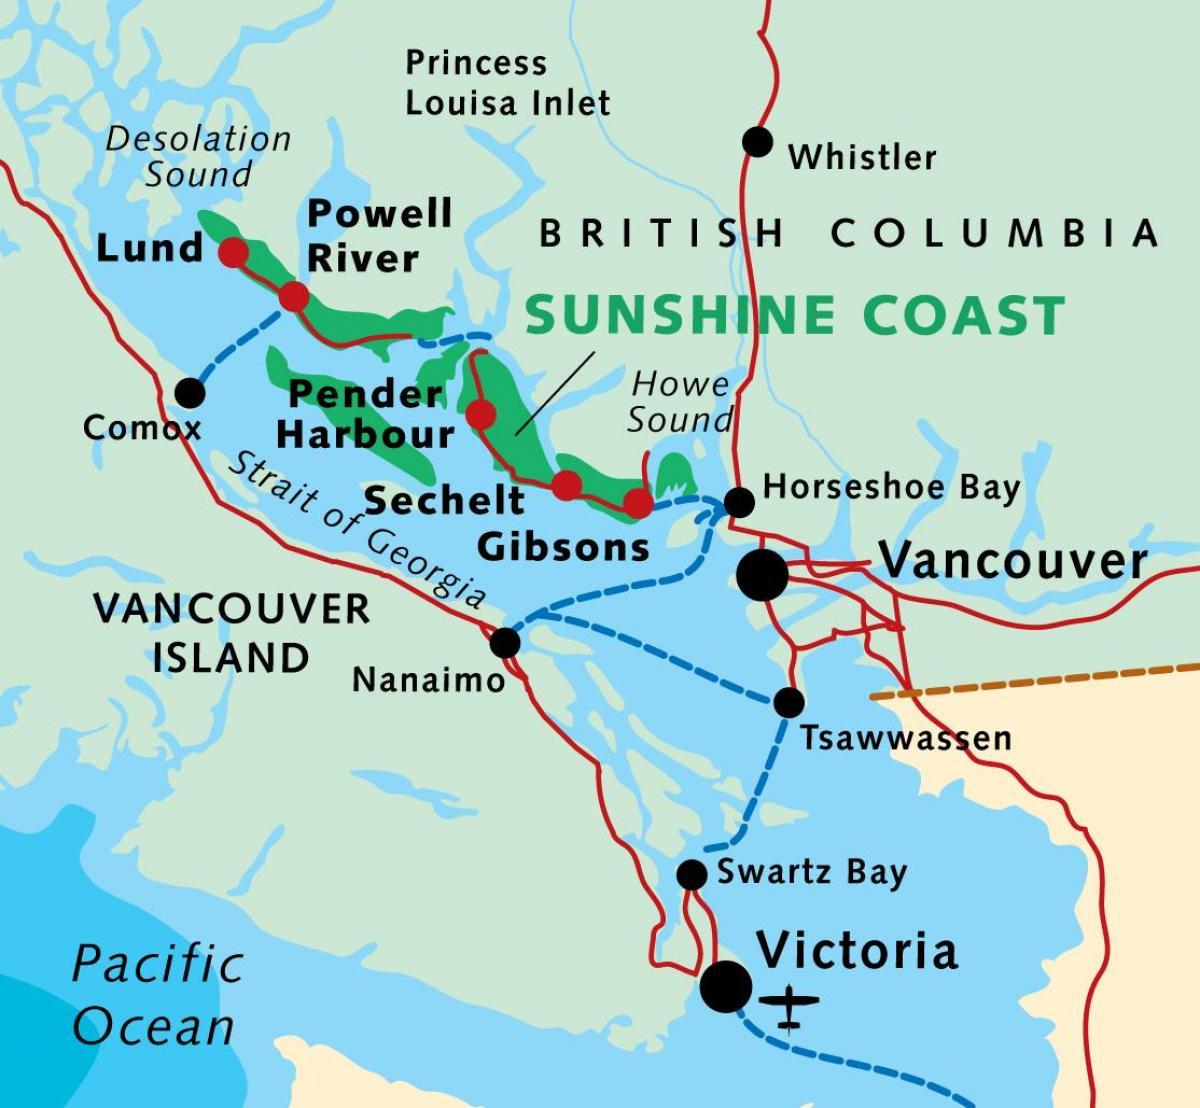 Sunshine Coast Canada Kort Kort Over Sunshine Coast Bc Canada